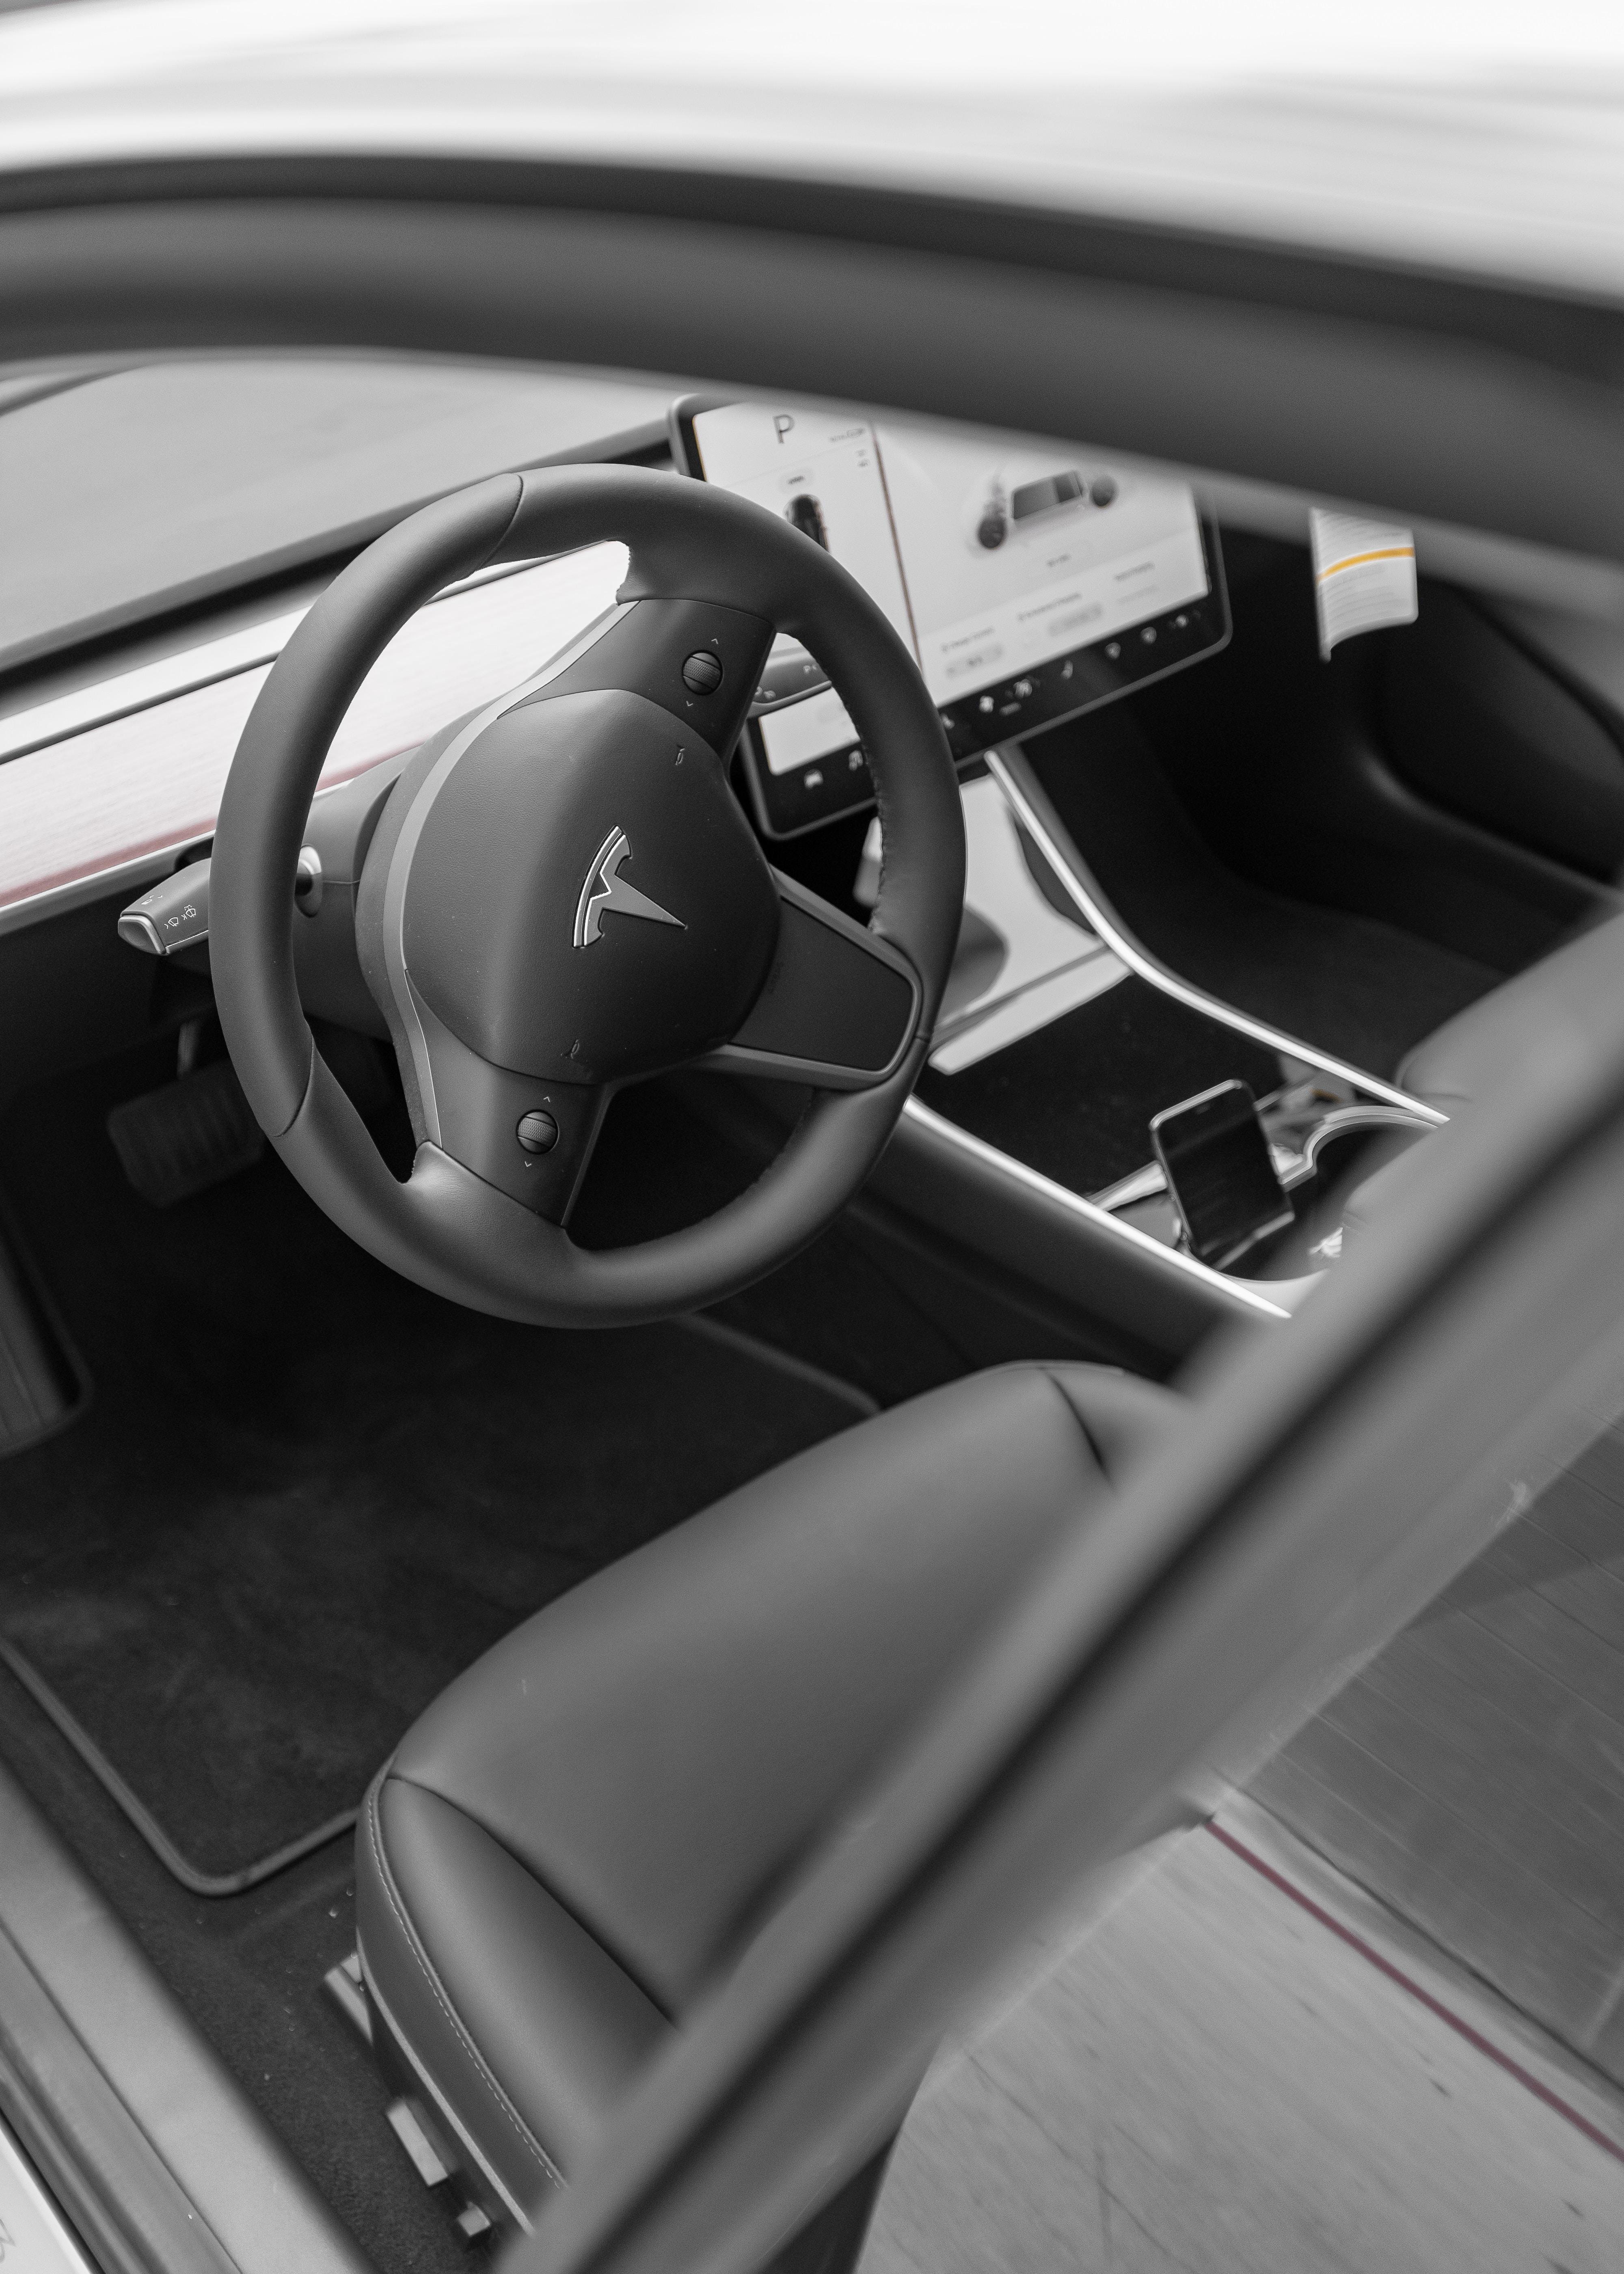 black and gray Citroen car interior